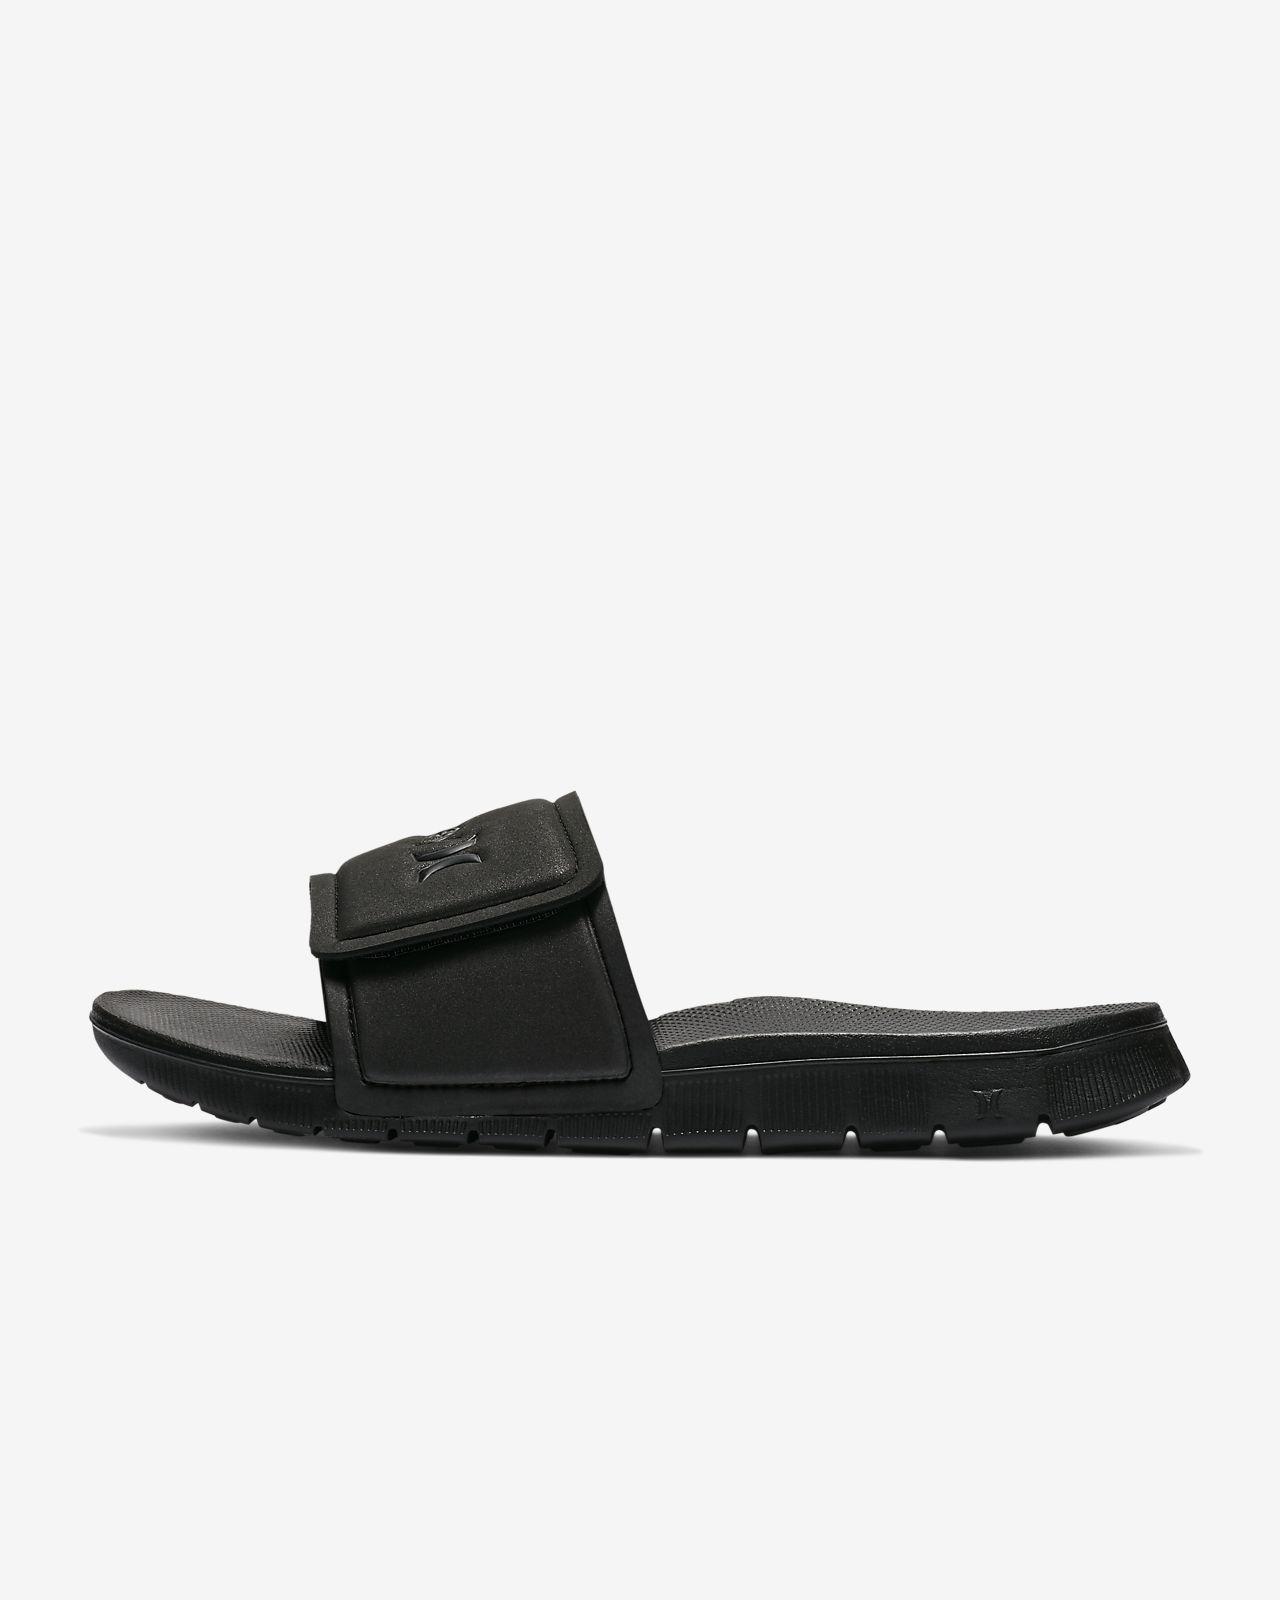 2da20c85122e Hurley Fusion Slide Men s Sandal. Nike.com CA